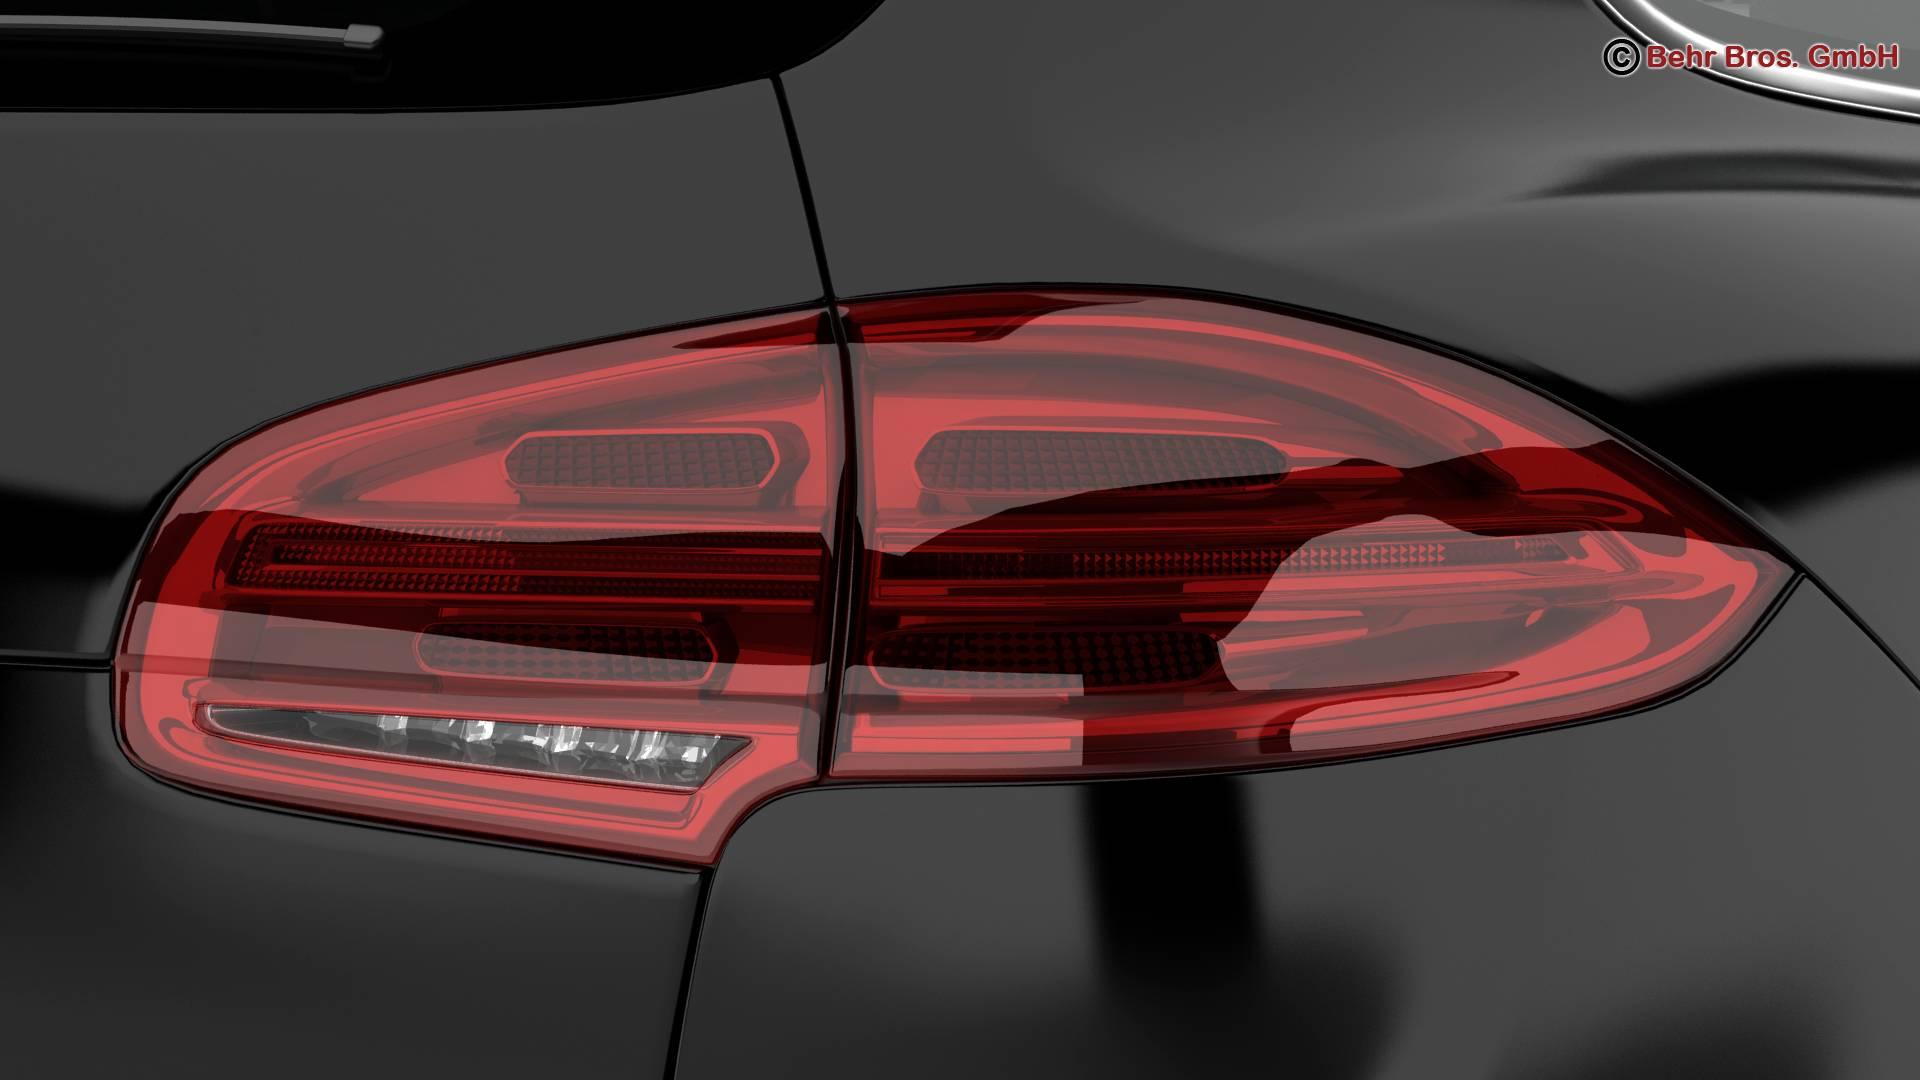 porsche cayenne turbo s 2016 3d model 3ds max fbx c4d lwo ma mb obj 214936